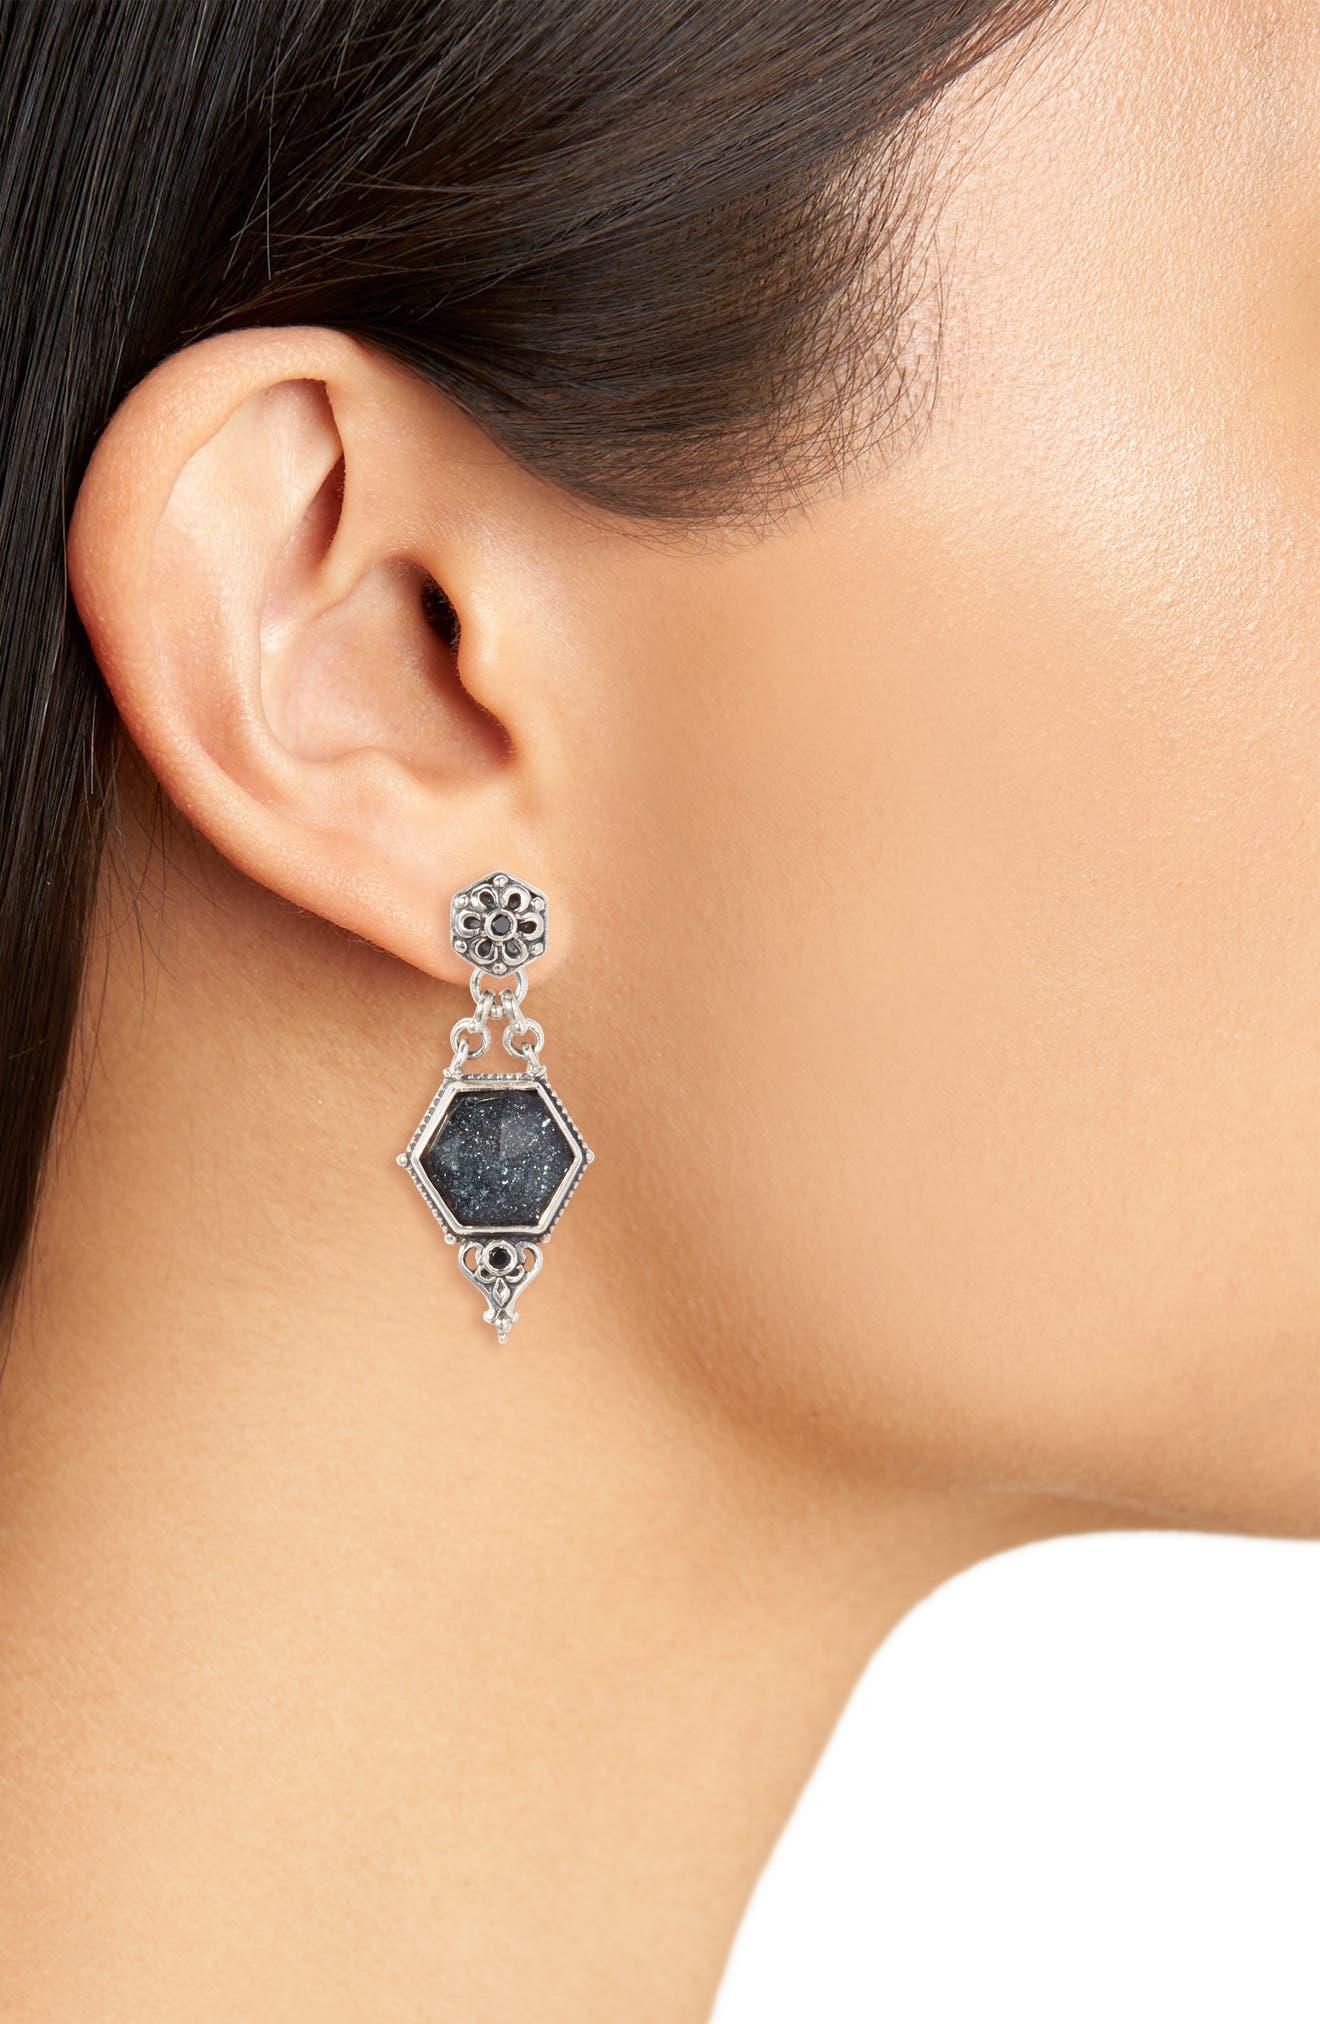 Santorini Hematite Octogan Drop Earrings,                             Alternate thumbnail 2, color,                             Silver/ Hematite